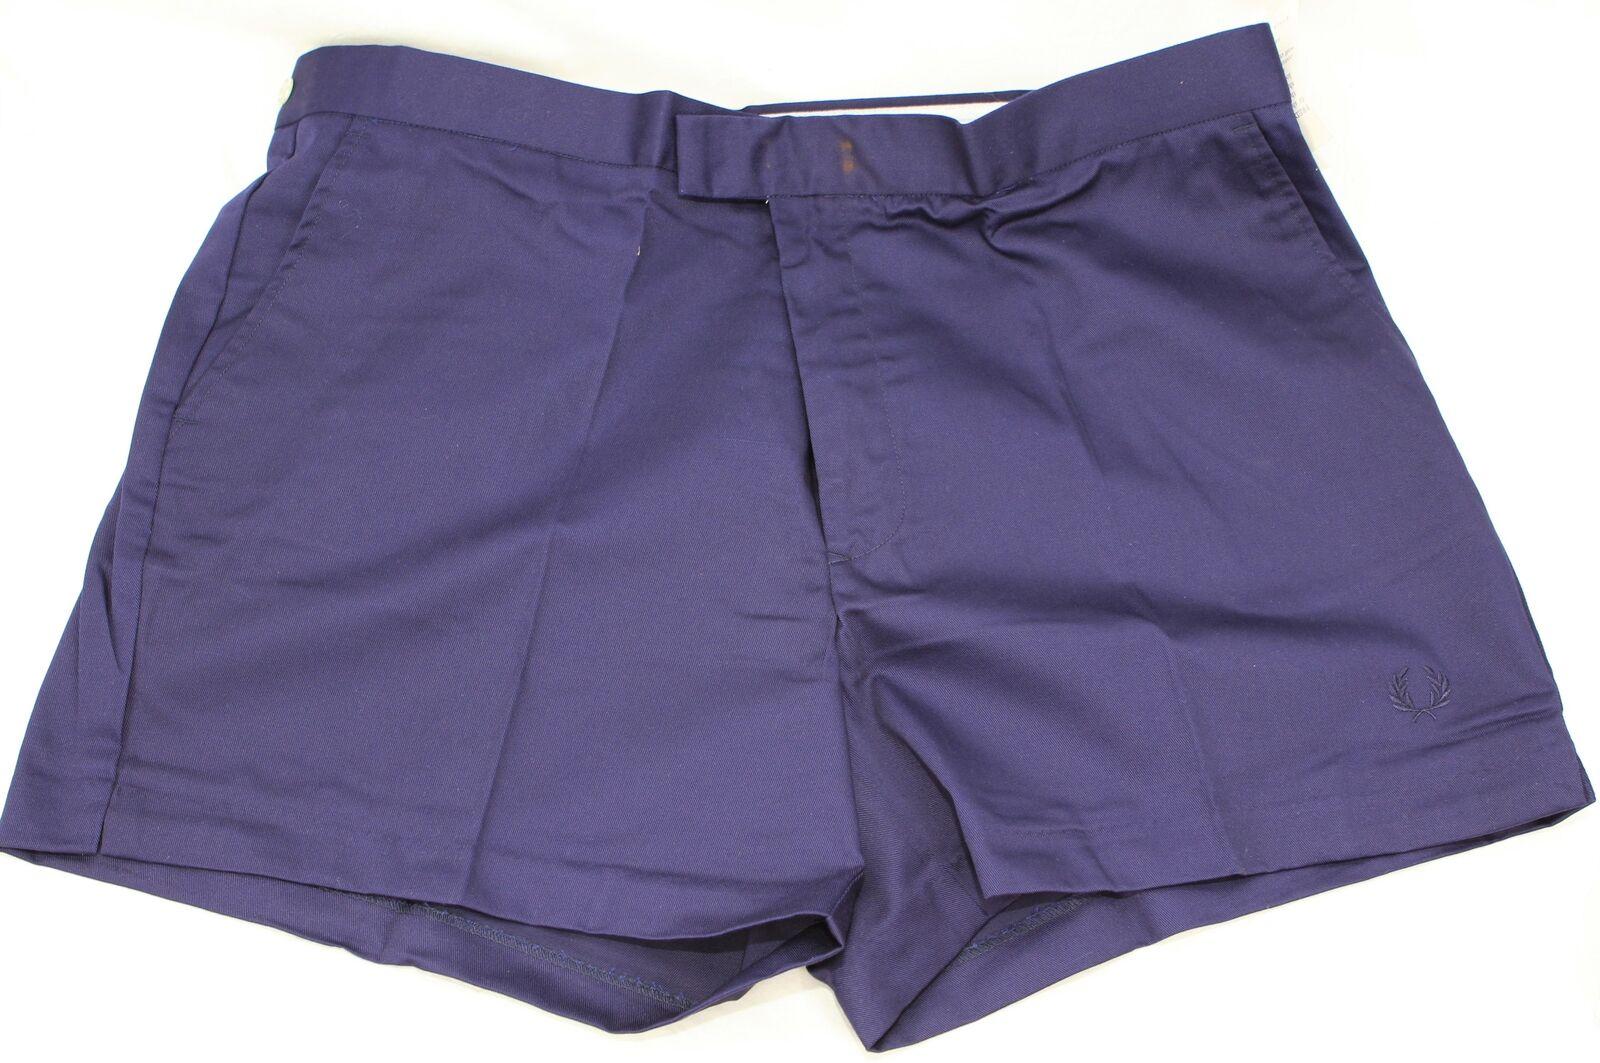 332fd68f1a8bd9 UNWORN Vintage 70s FRED PERRY Tennis SHORTS 44 112 cm 208 Y bluee Navy  nwdmpy21538-Shorts